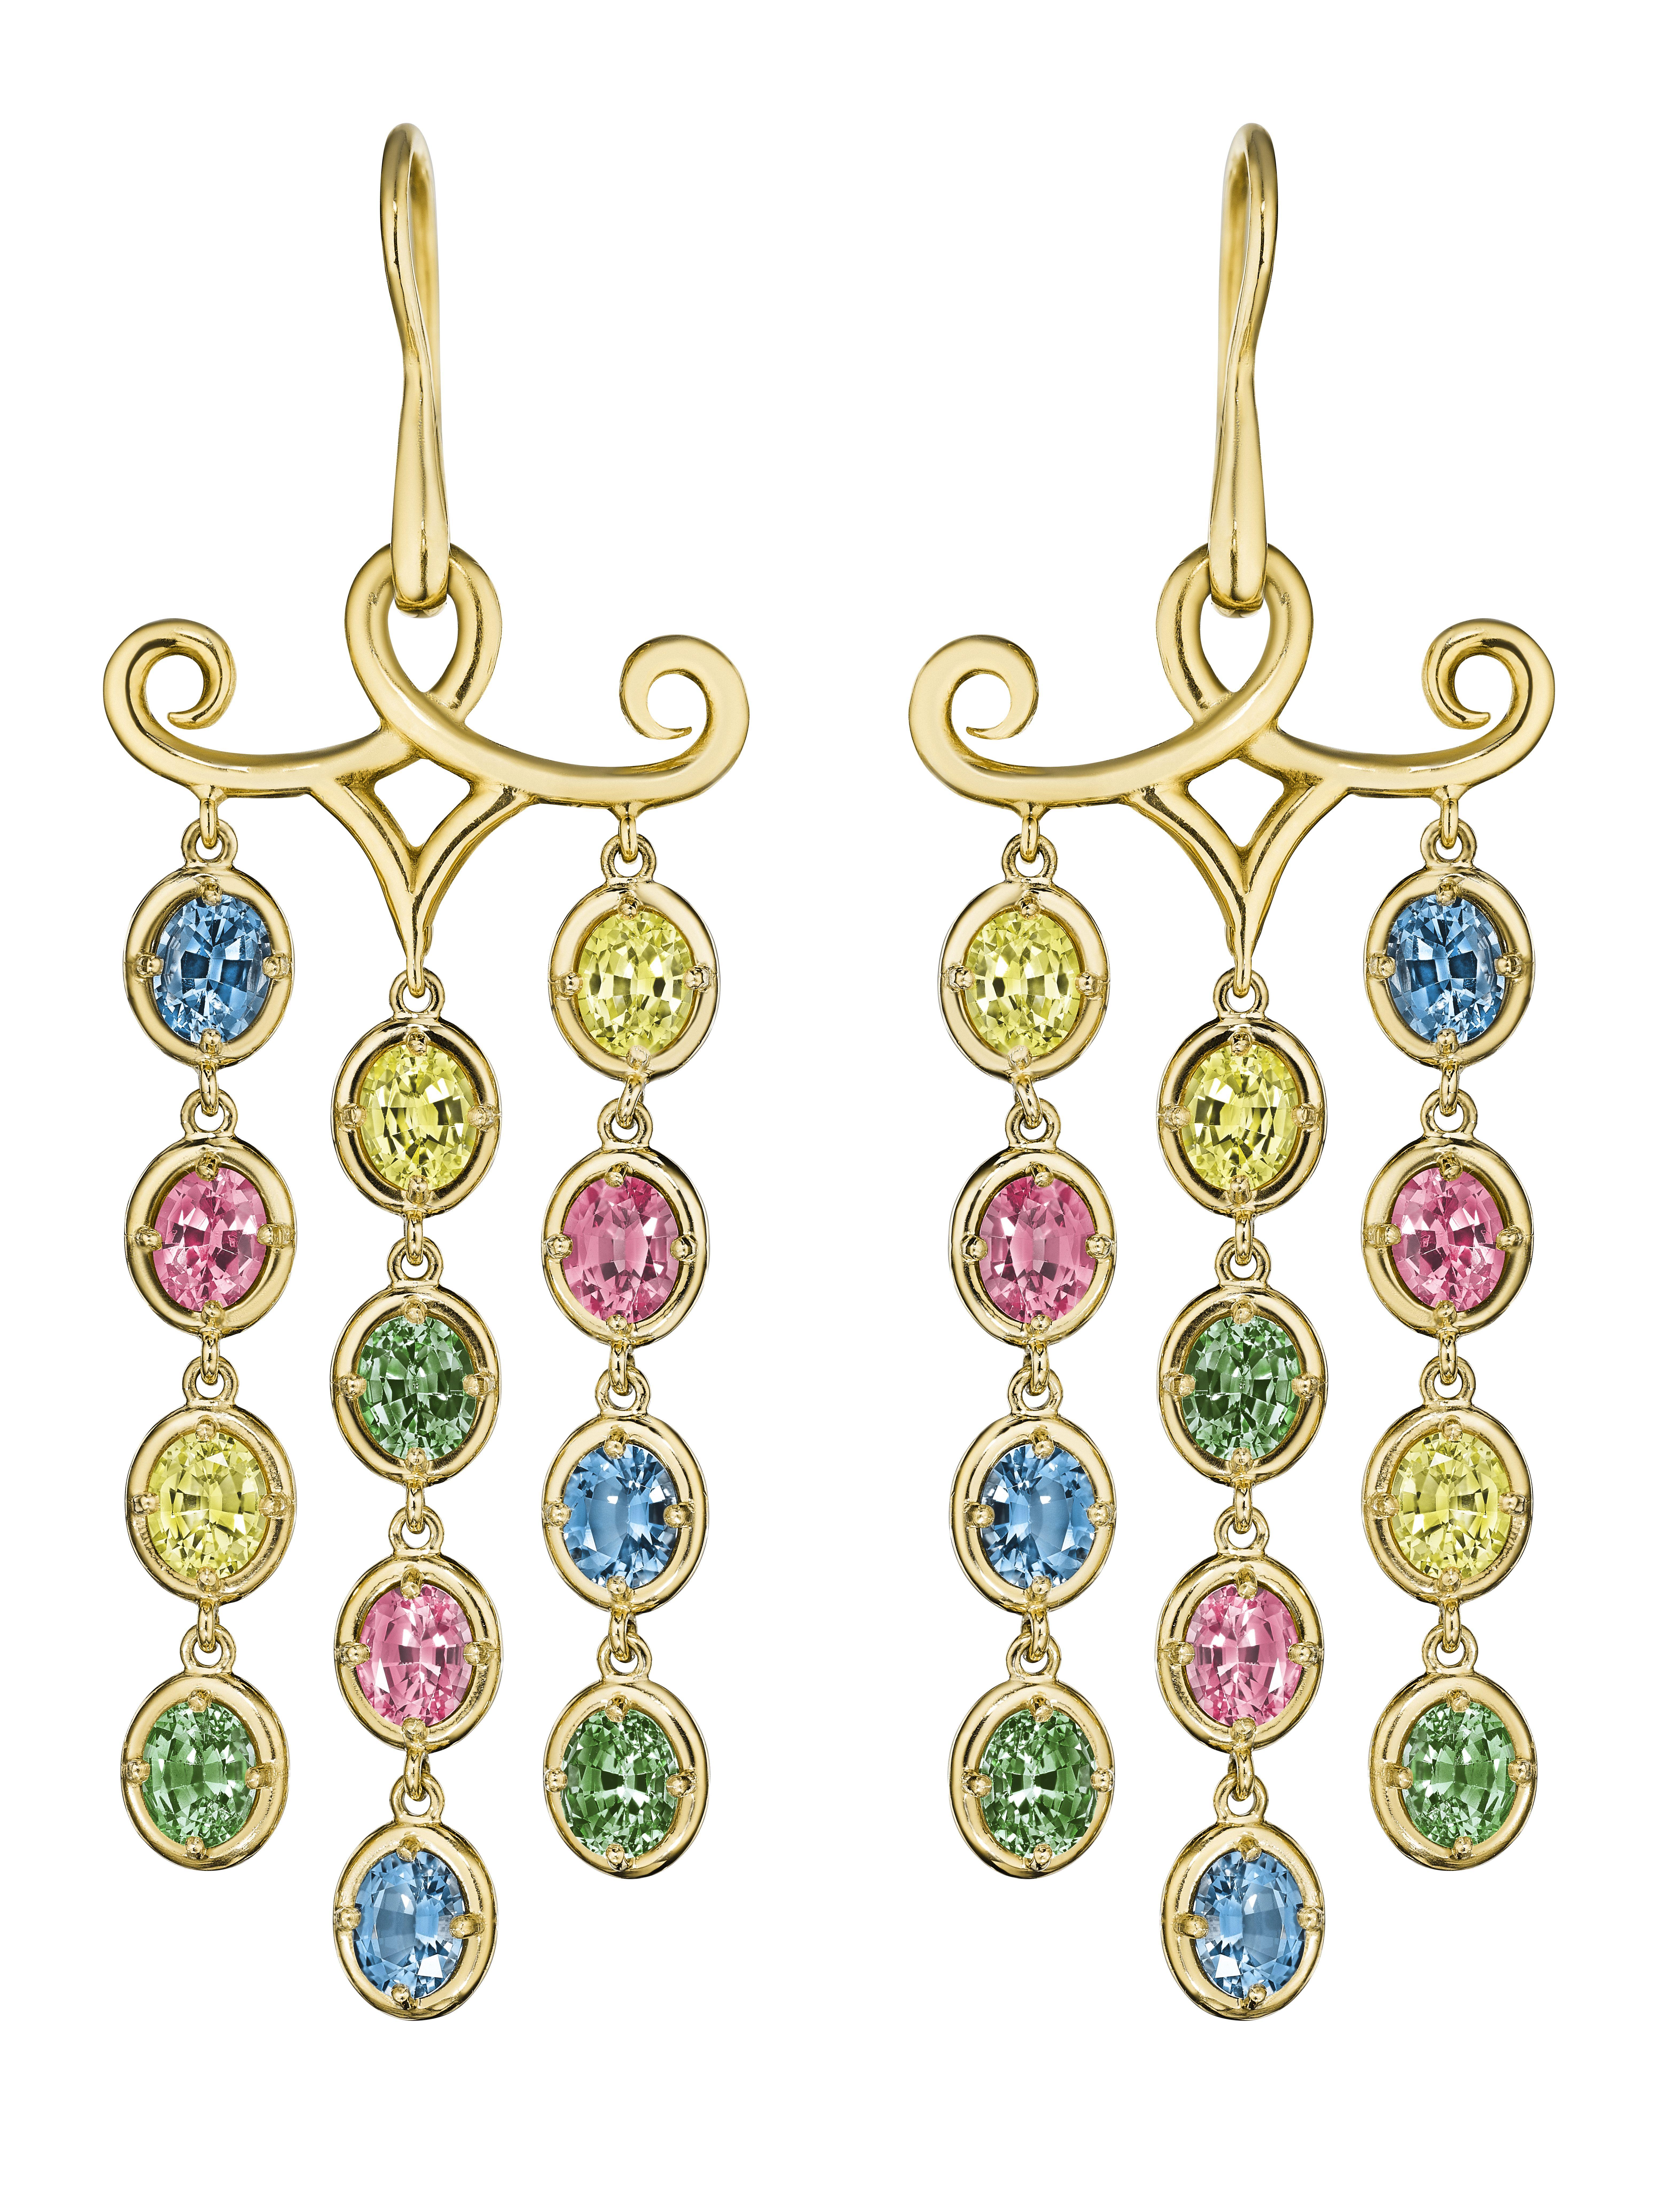 18 karat yellow gold chandelier earrings with rainbow sapphires dangling from a scroll work design #hammerman #hammermanjewels #hammermanbrothers #highjewelry #luxuryjewelry #jewelry #earrings #rainbow #sapphires